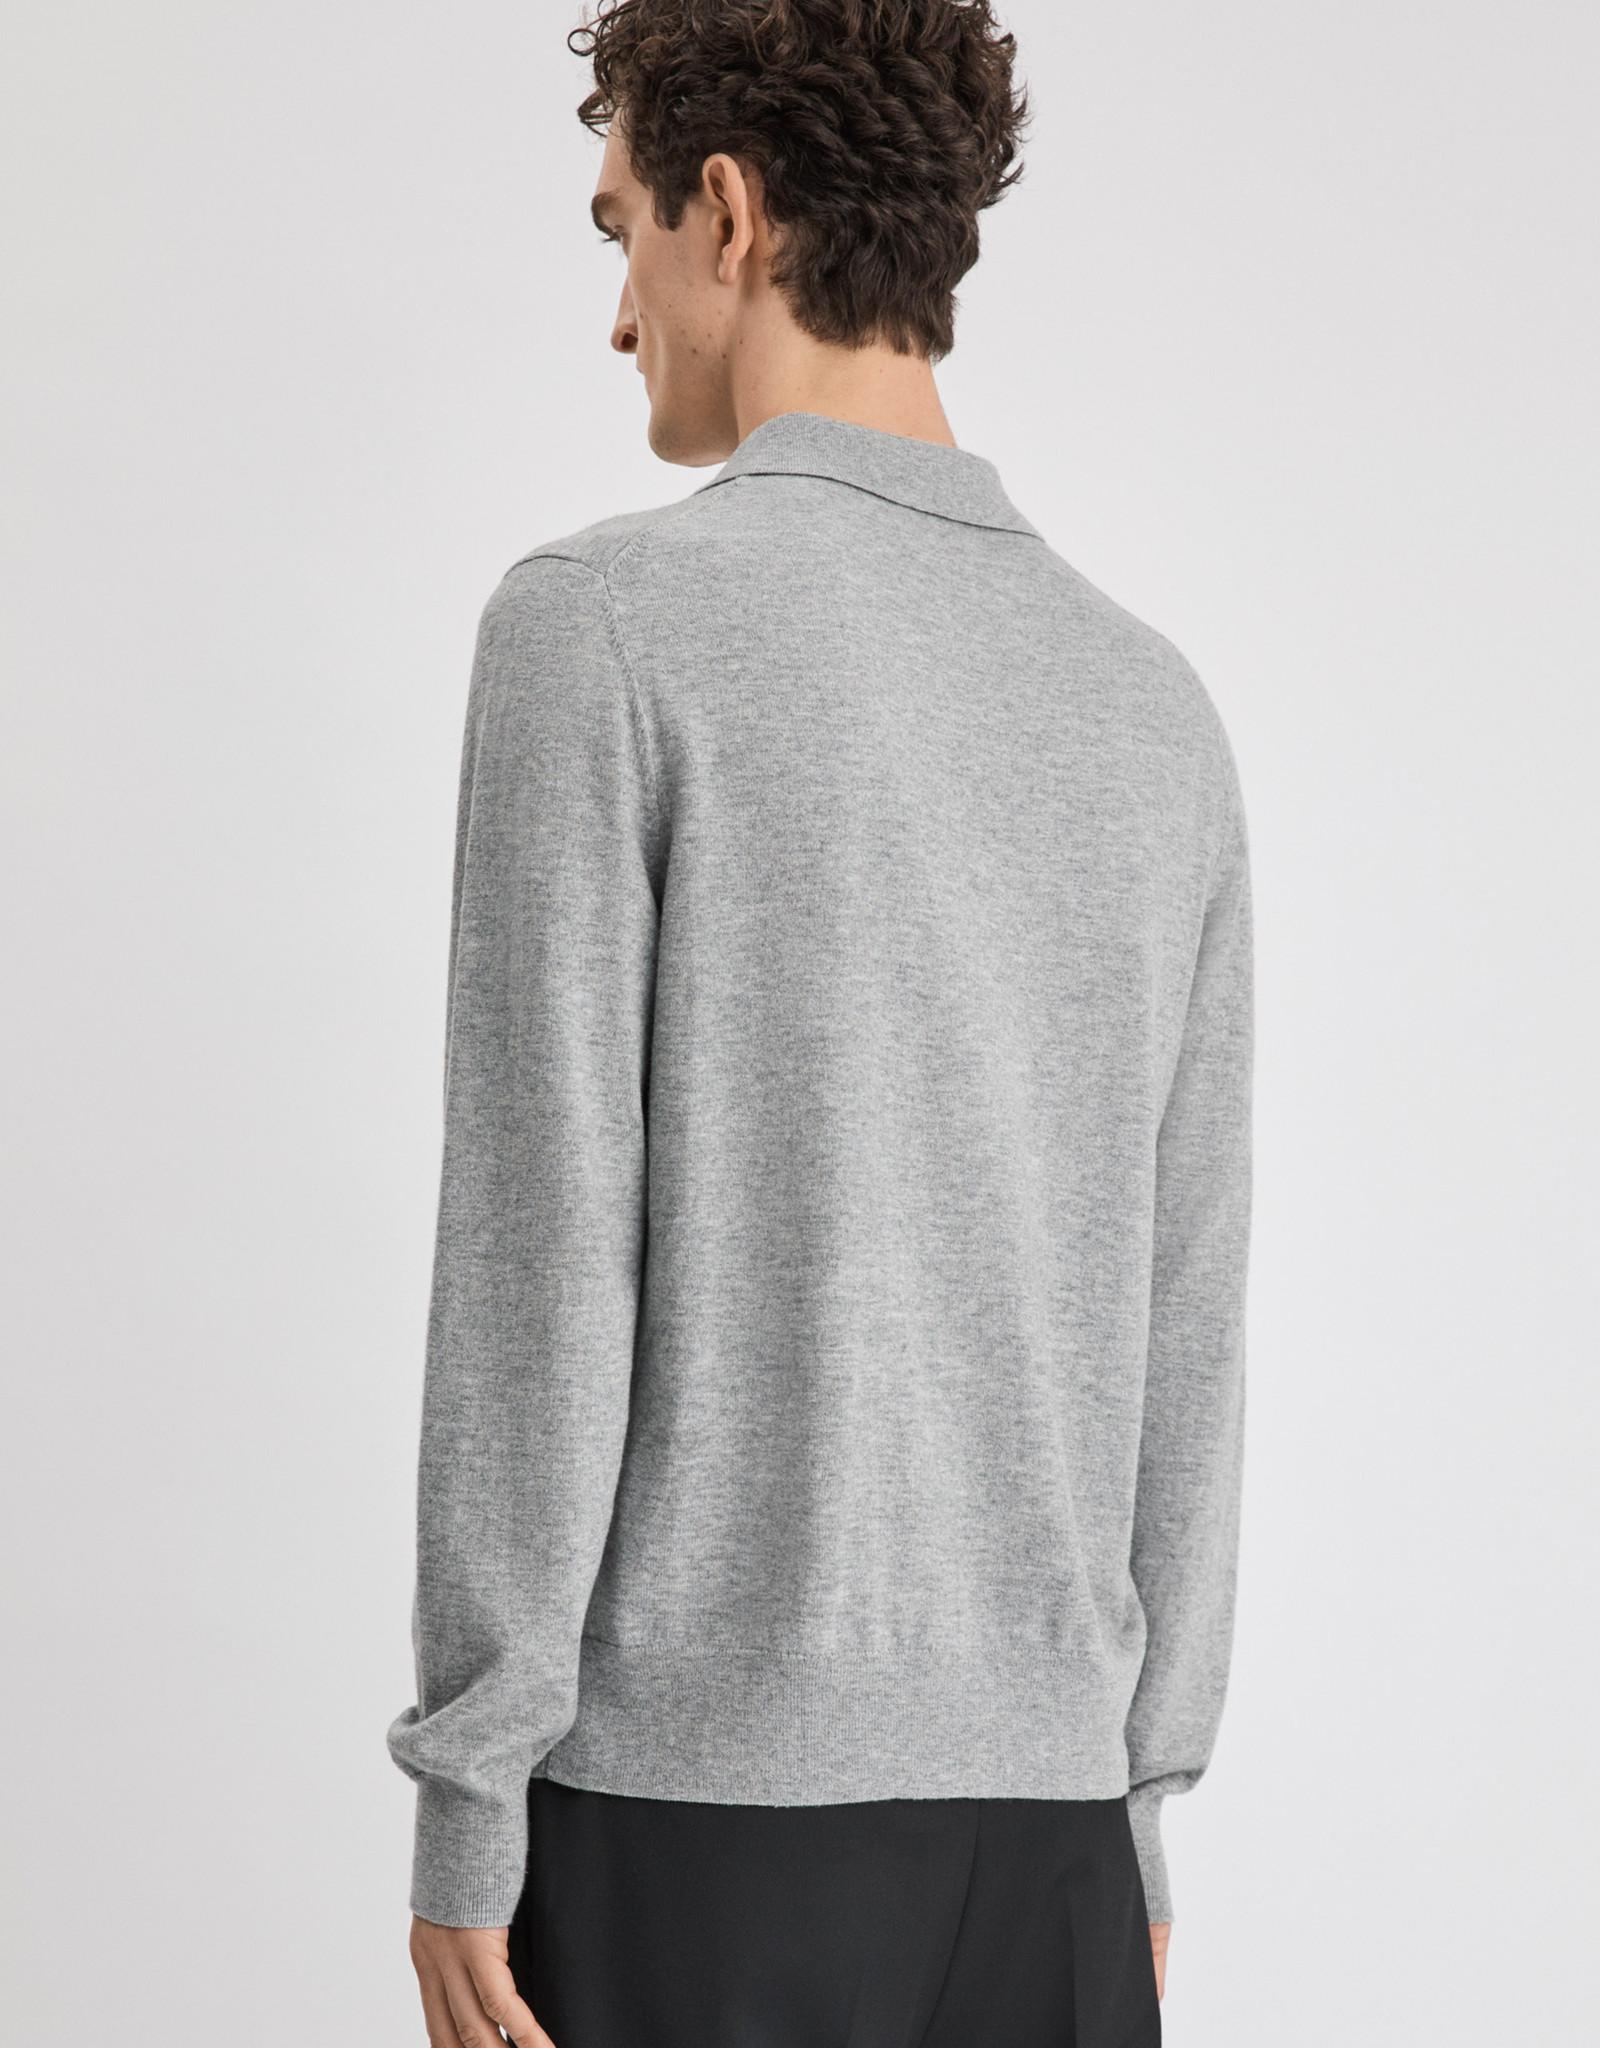 Filippa K M. Knitted Polo Shirt Light Grey